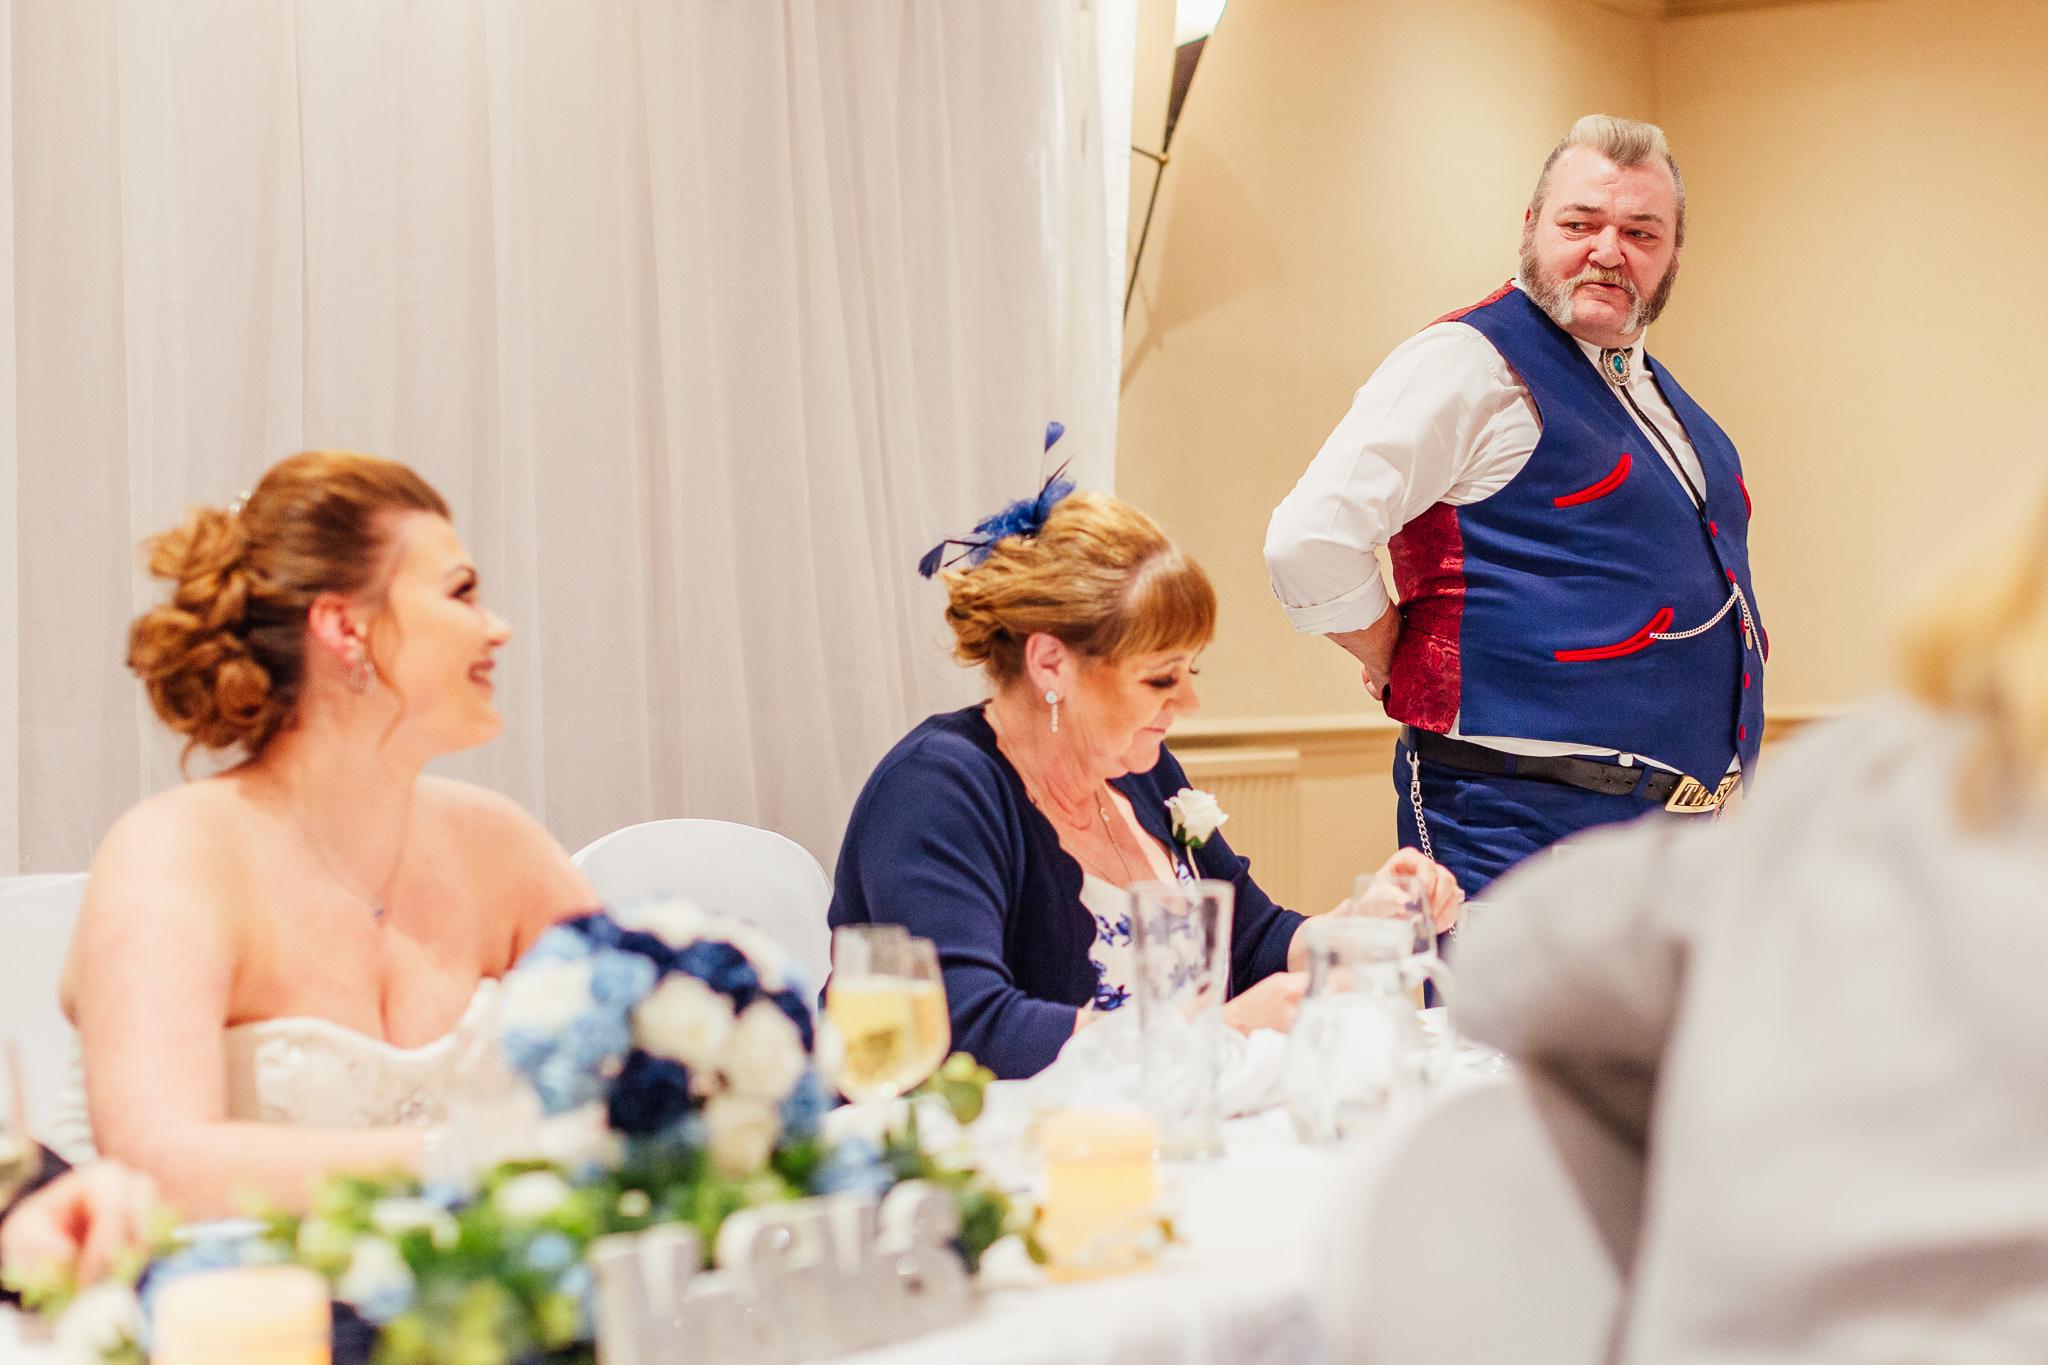 Mollingtonbanastre_wedding-17.jpg